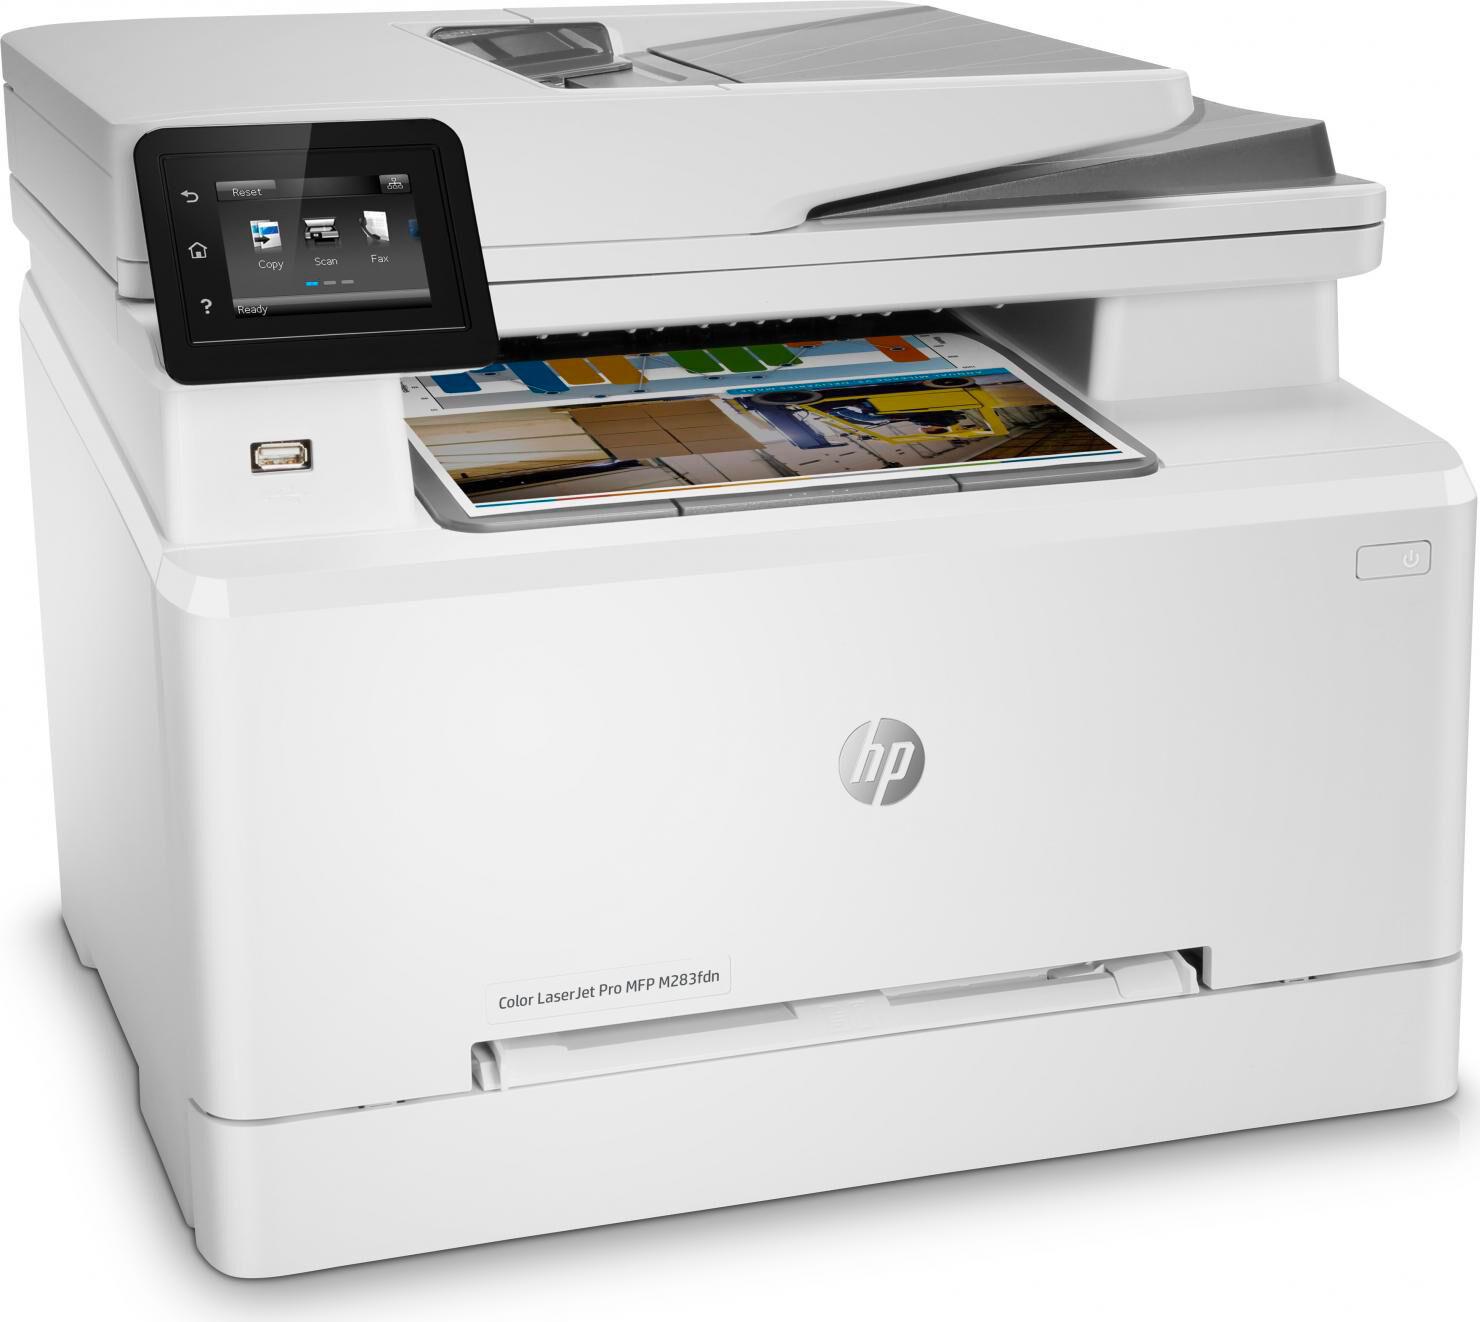 HP 7kw74a#b19 Stampante Multifunzione A Colori Laser Wifi 600 X 600 Dpi 22 Ppm A4 - 7kw74a M283fdn Color Laserjet Pro